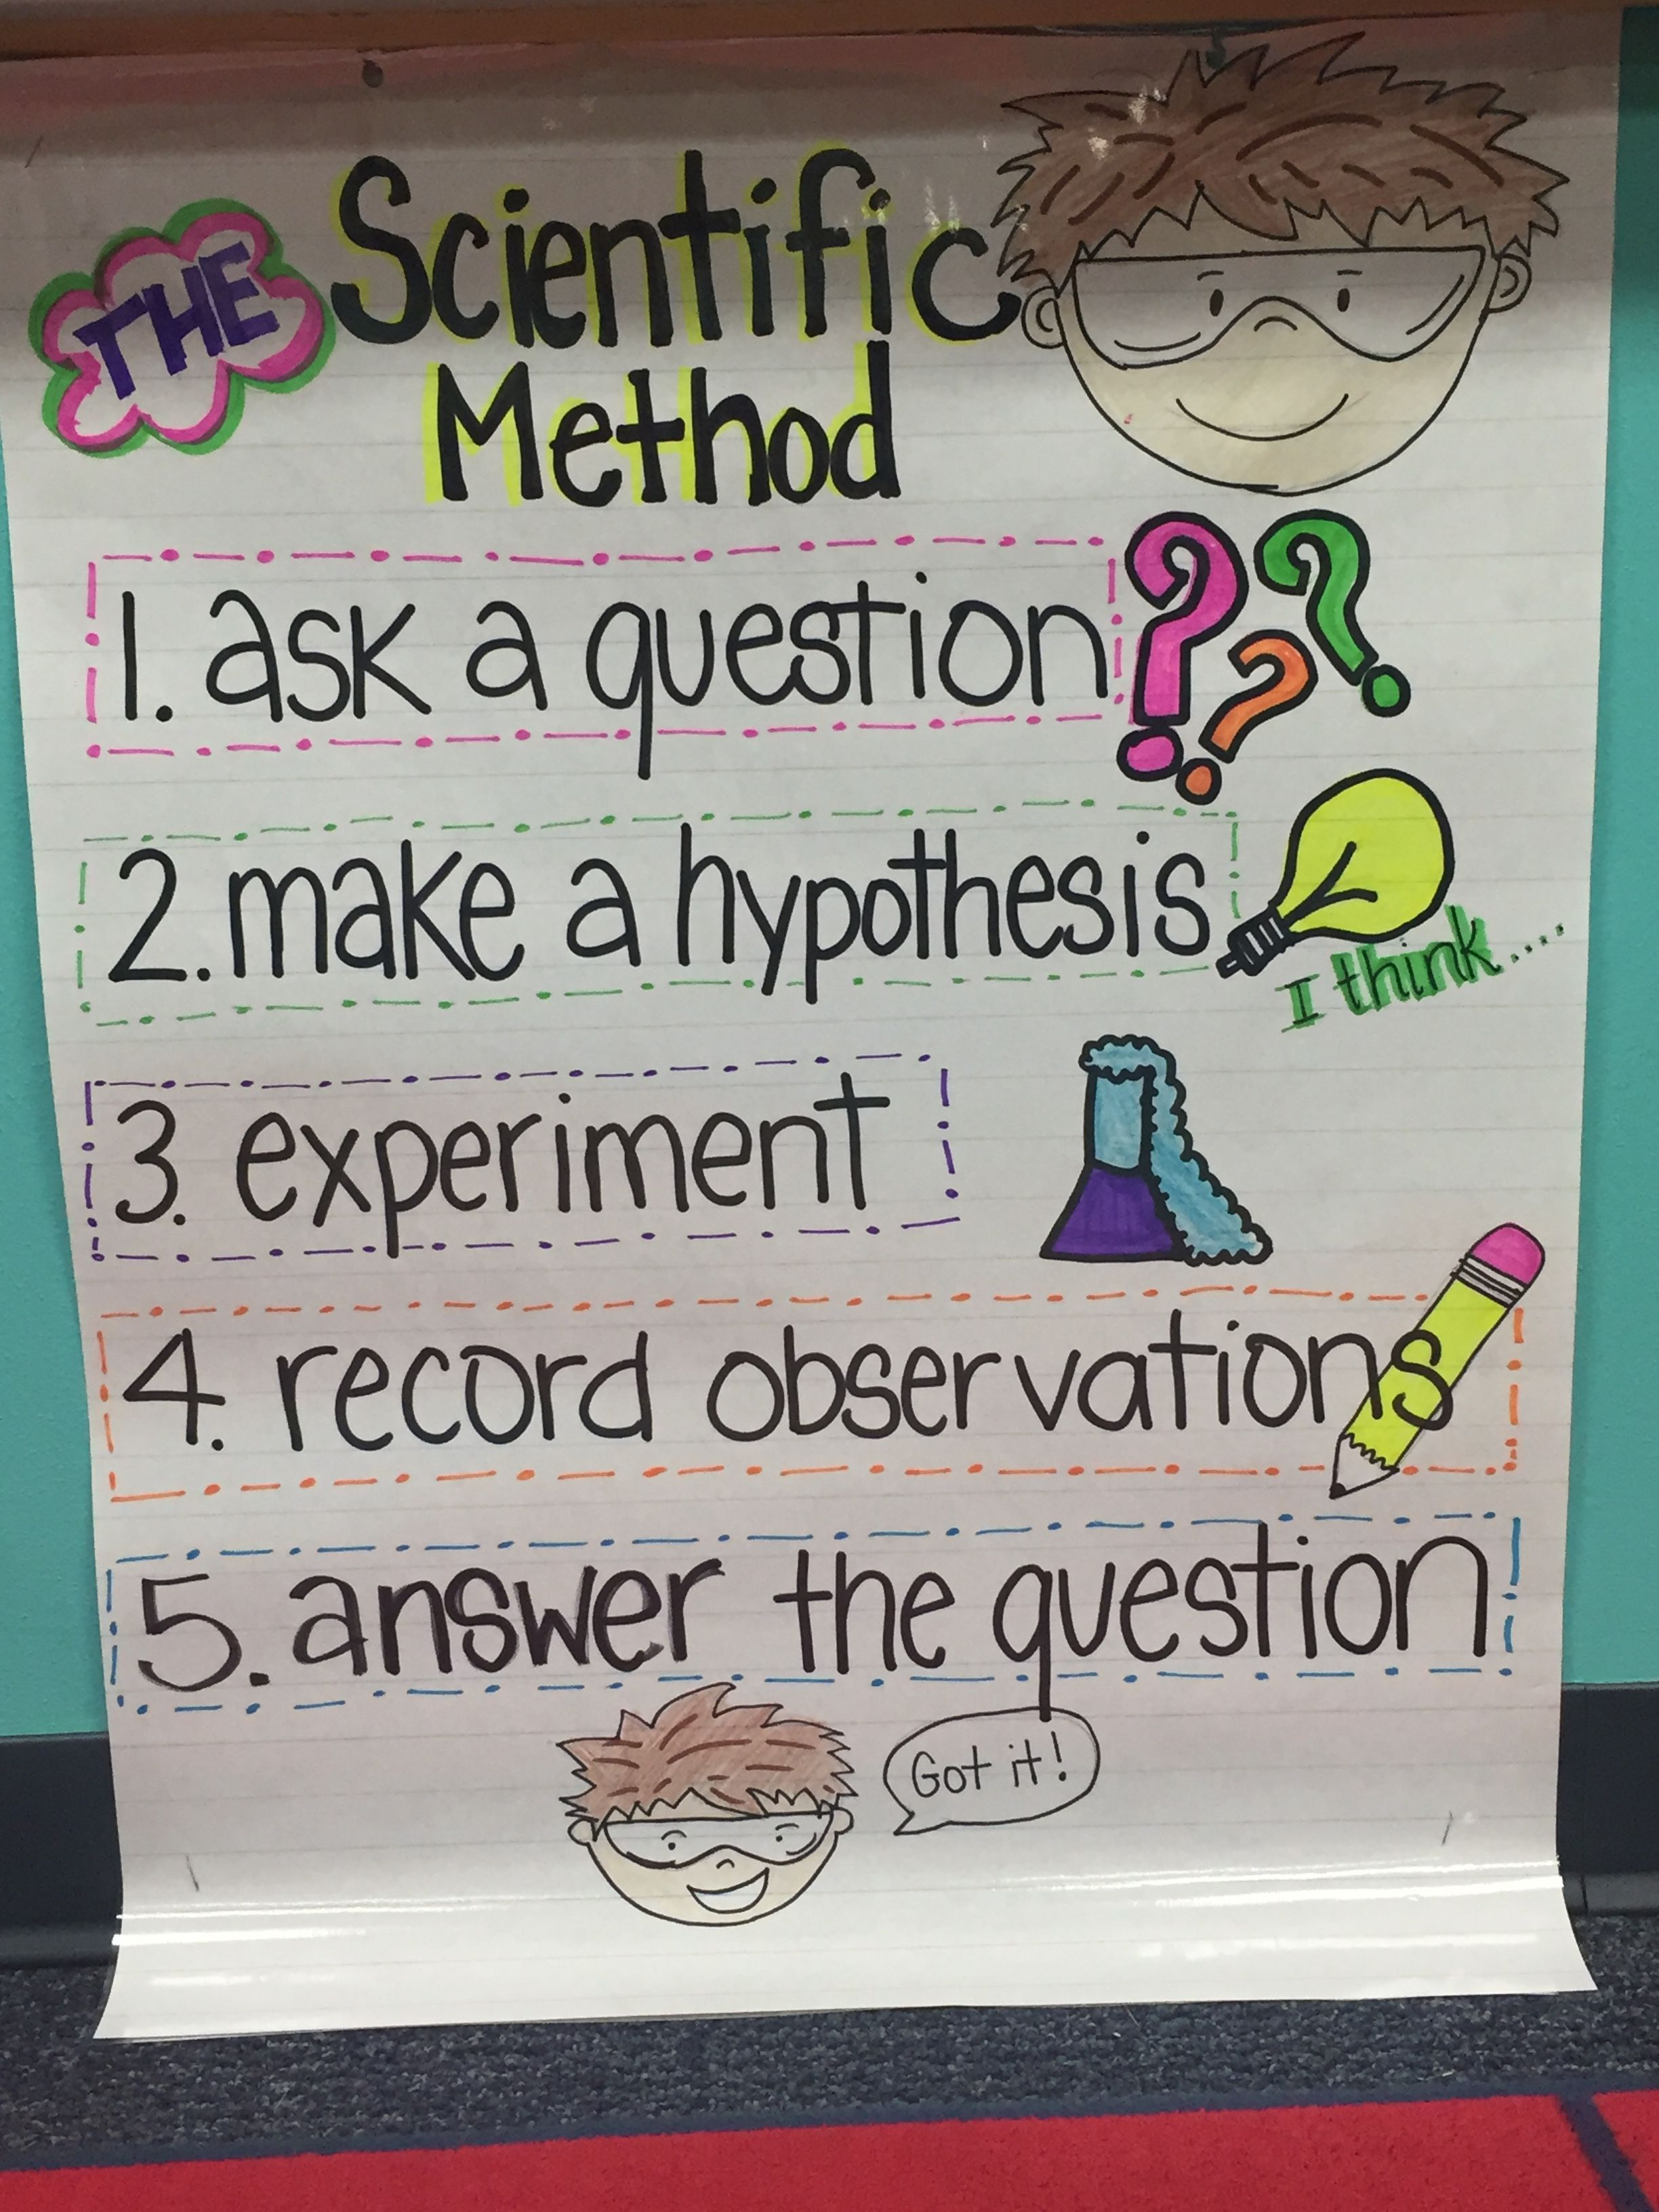 Scientific Method 3rd Grade Worksheet In 2020 Sight Words Kindergarten Kindergarten Worksheets Sight Words Third Grade Sight Words